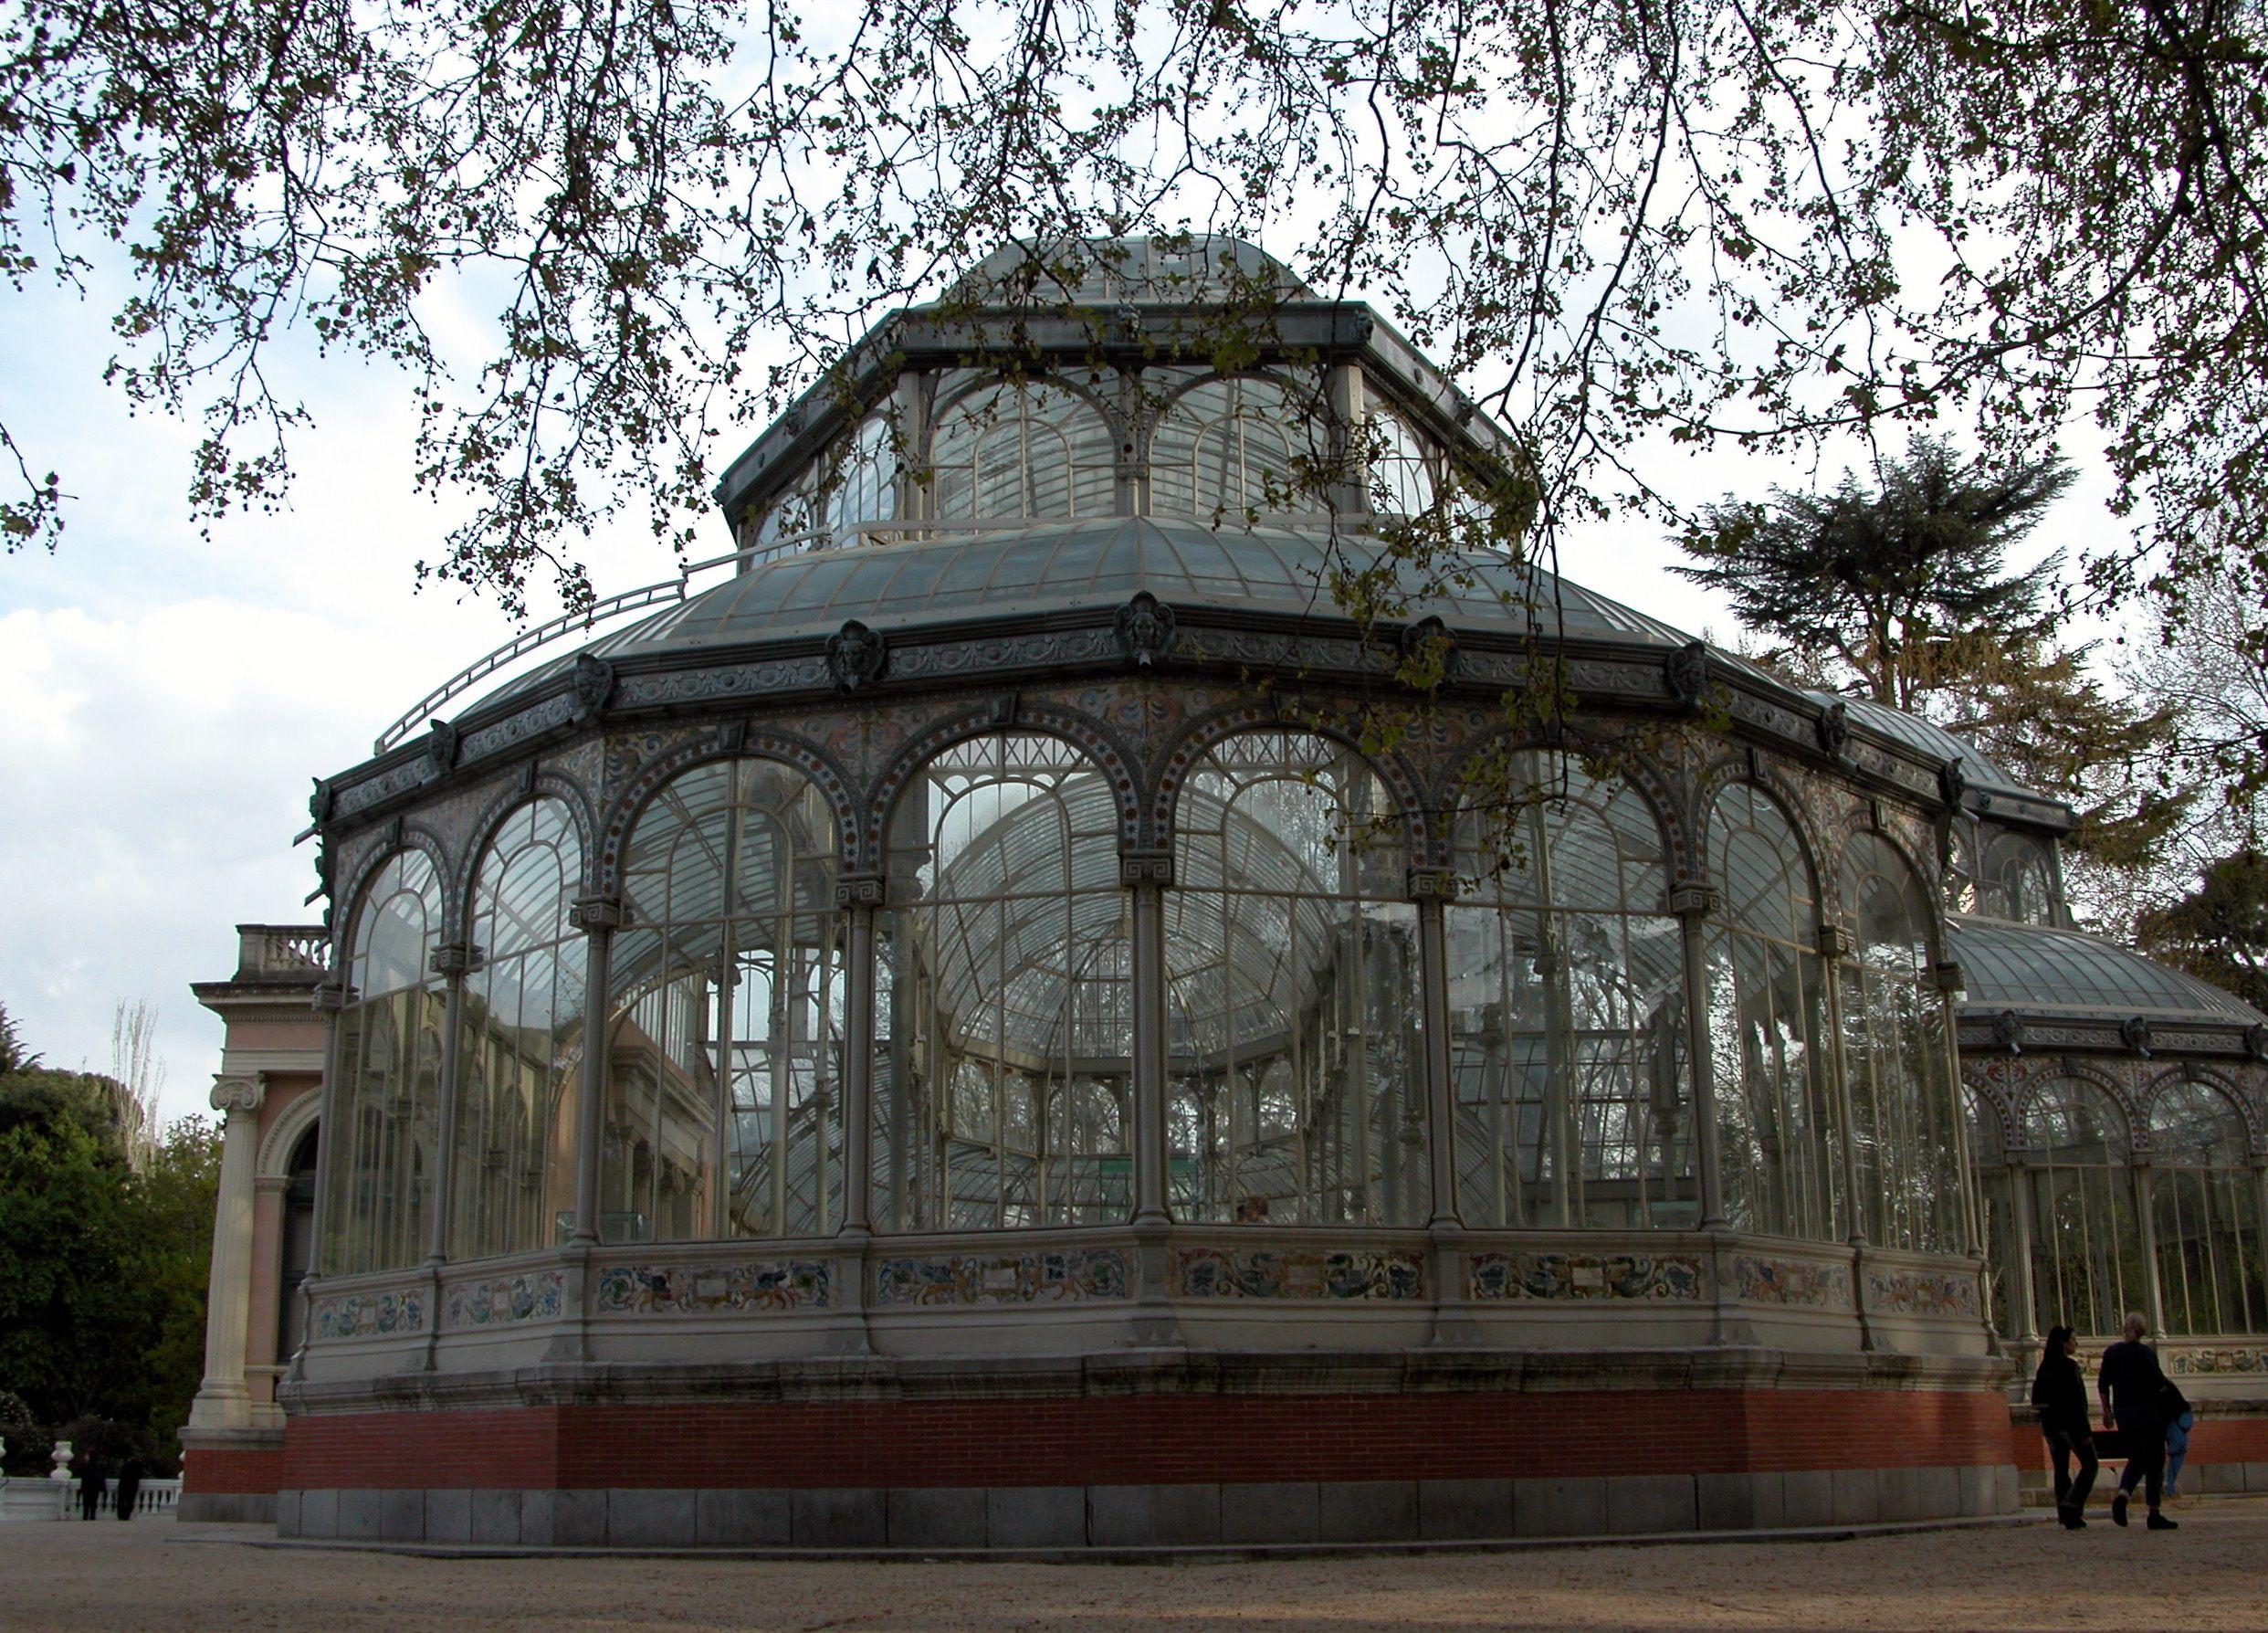 Palacio de Cristal is a beautiful crystal building. The palace is in Retiro Park, Madirid Spain.